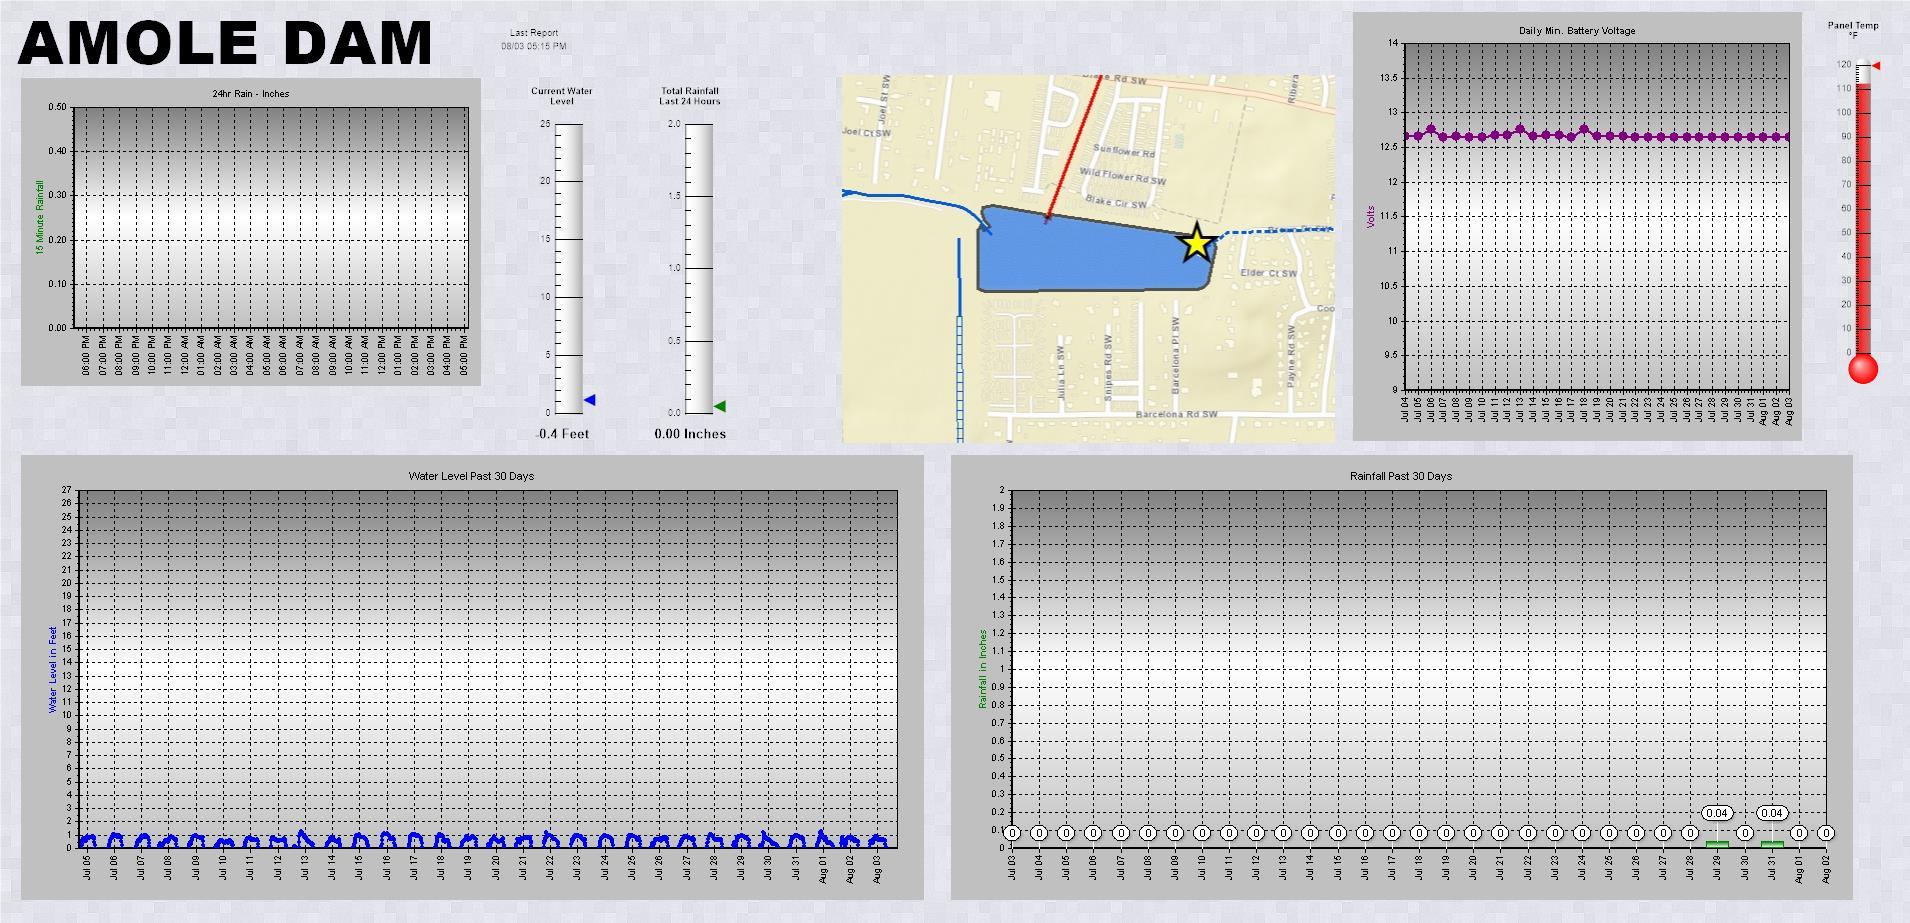 Amole Dam telemetry data